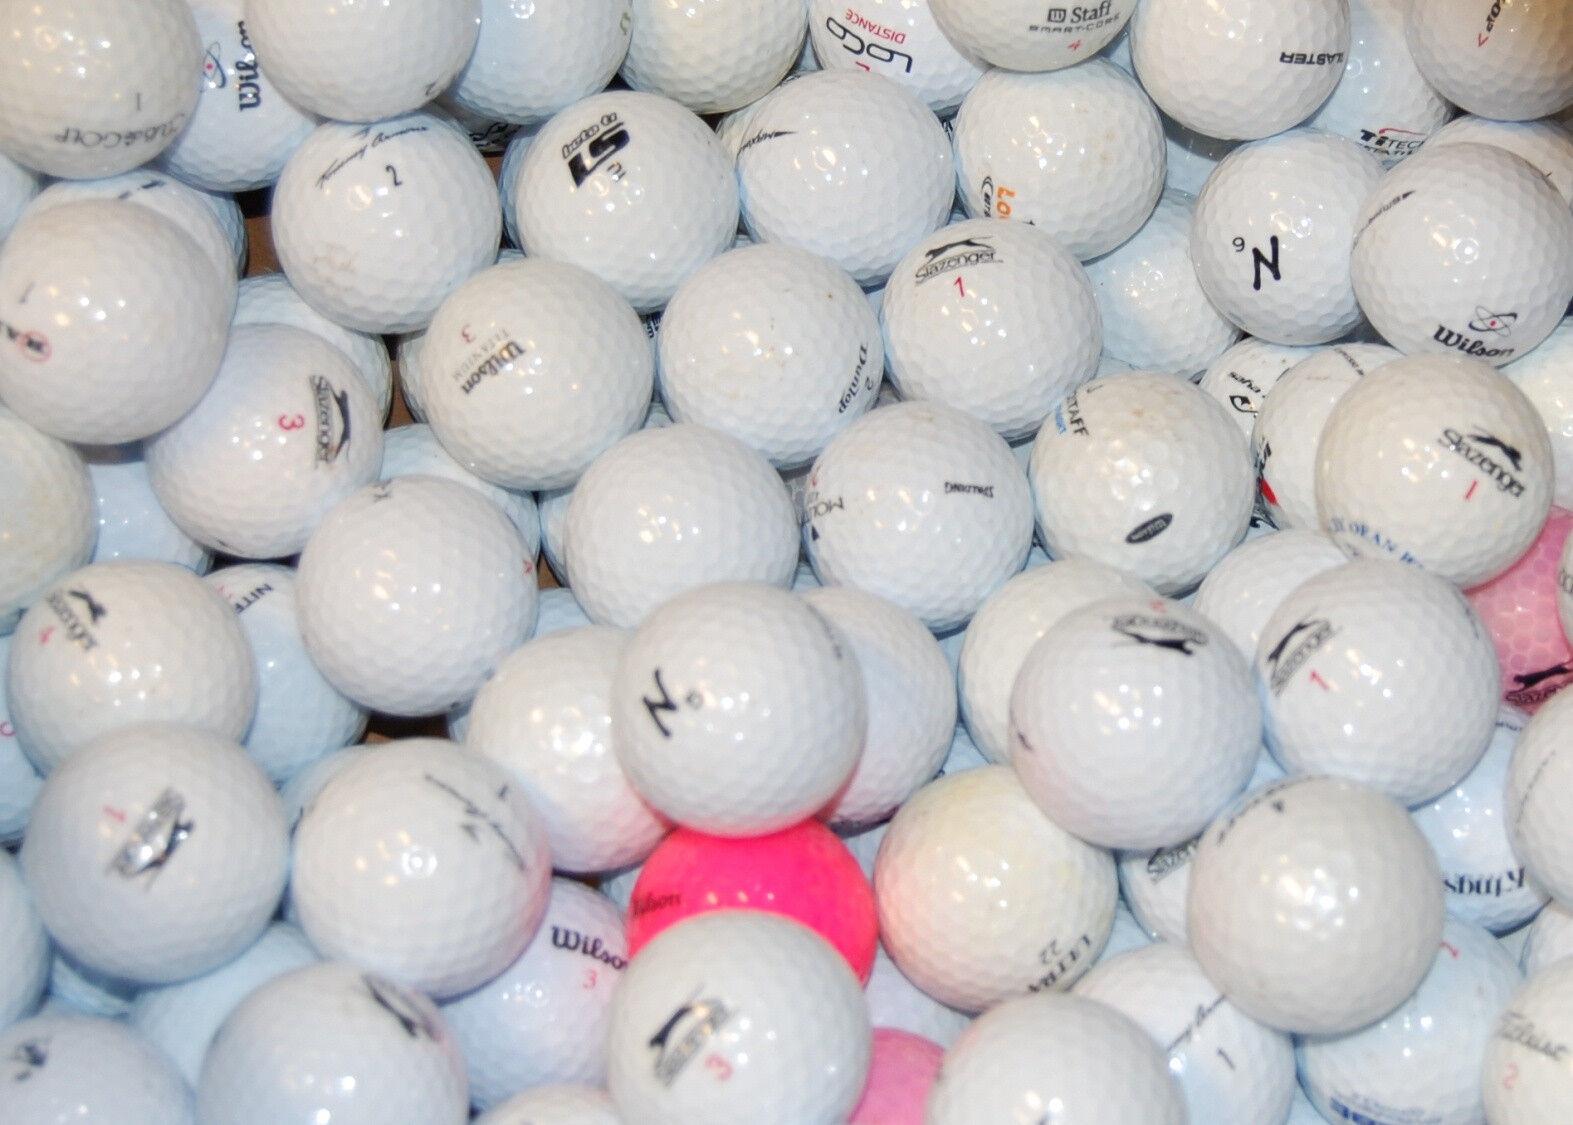 100 Assorted  AAAAA used golf balls .90 with free shipping